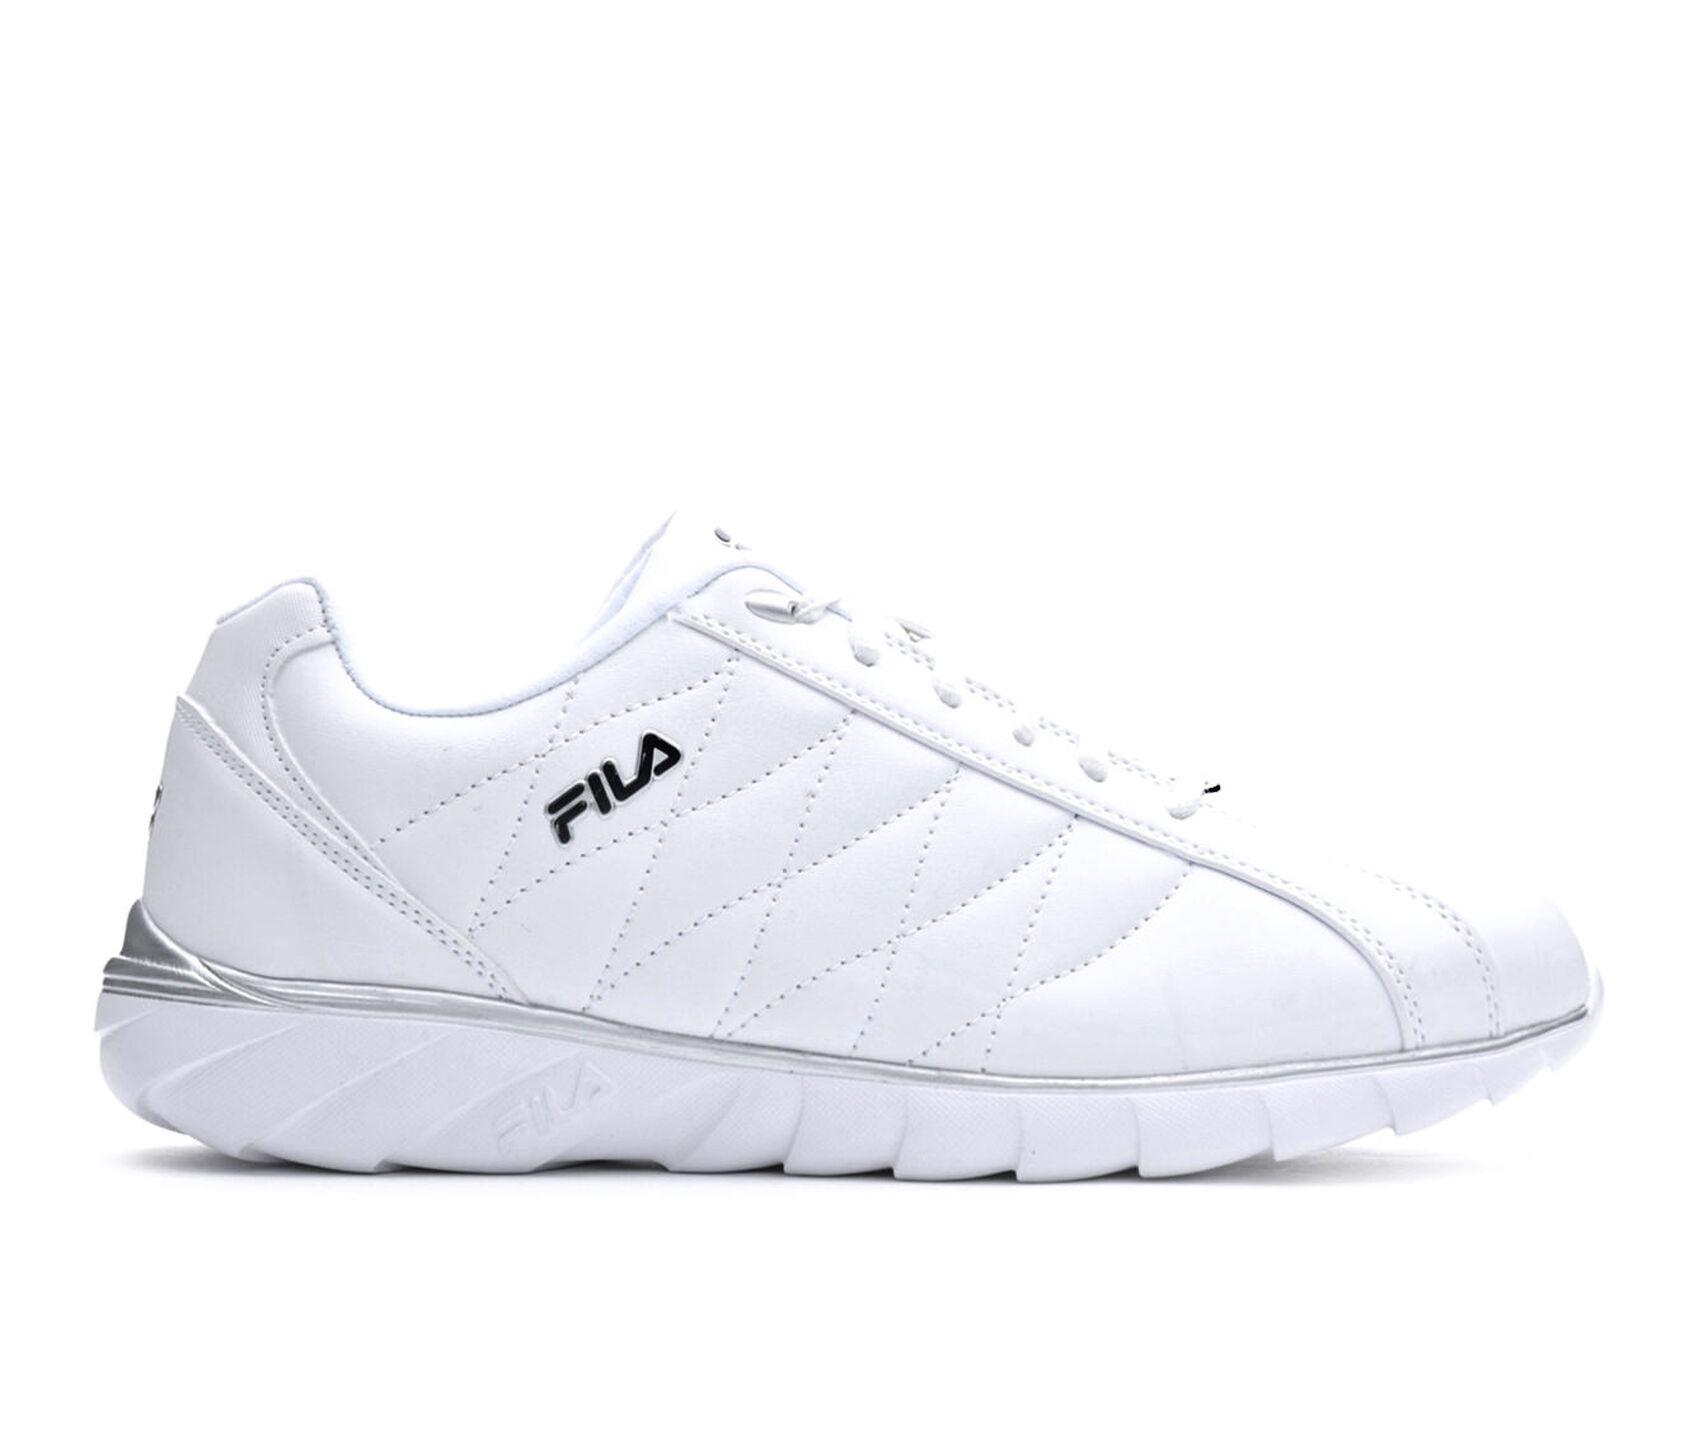 692744c99ac1 Men s Fila Sable Athletic Sneakers